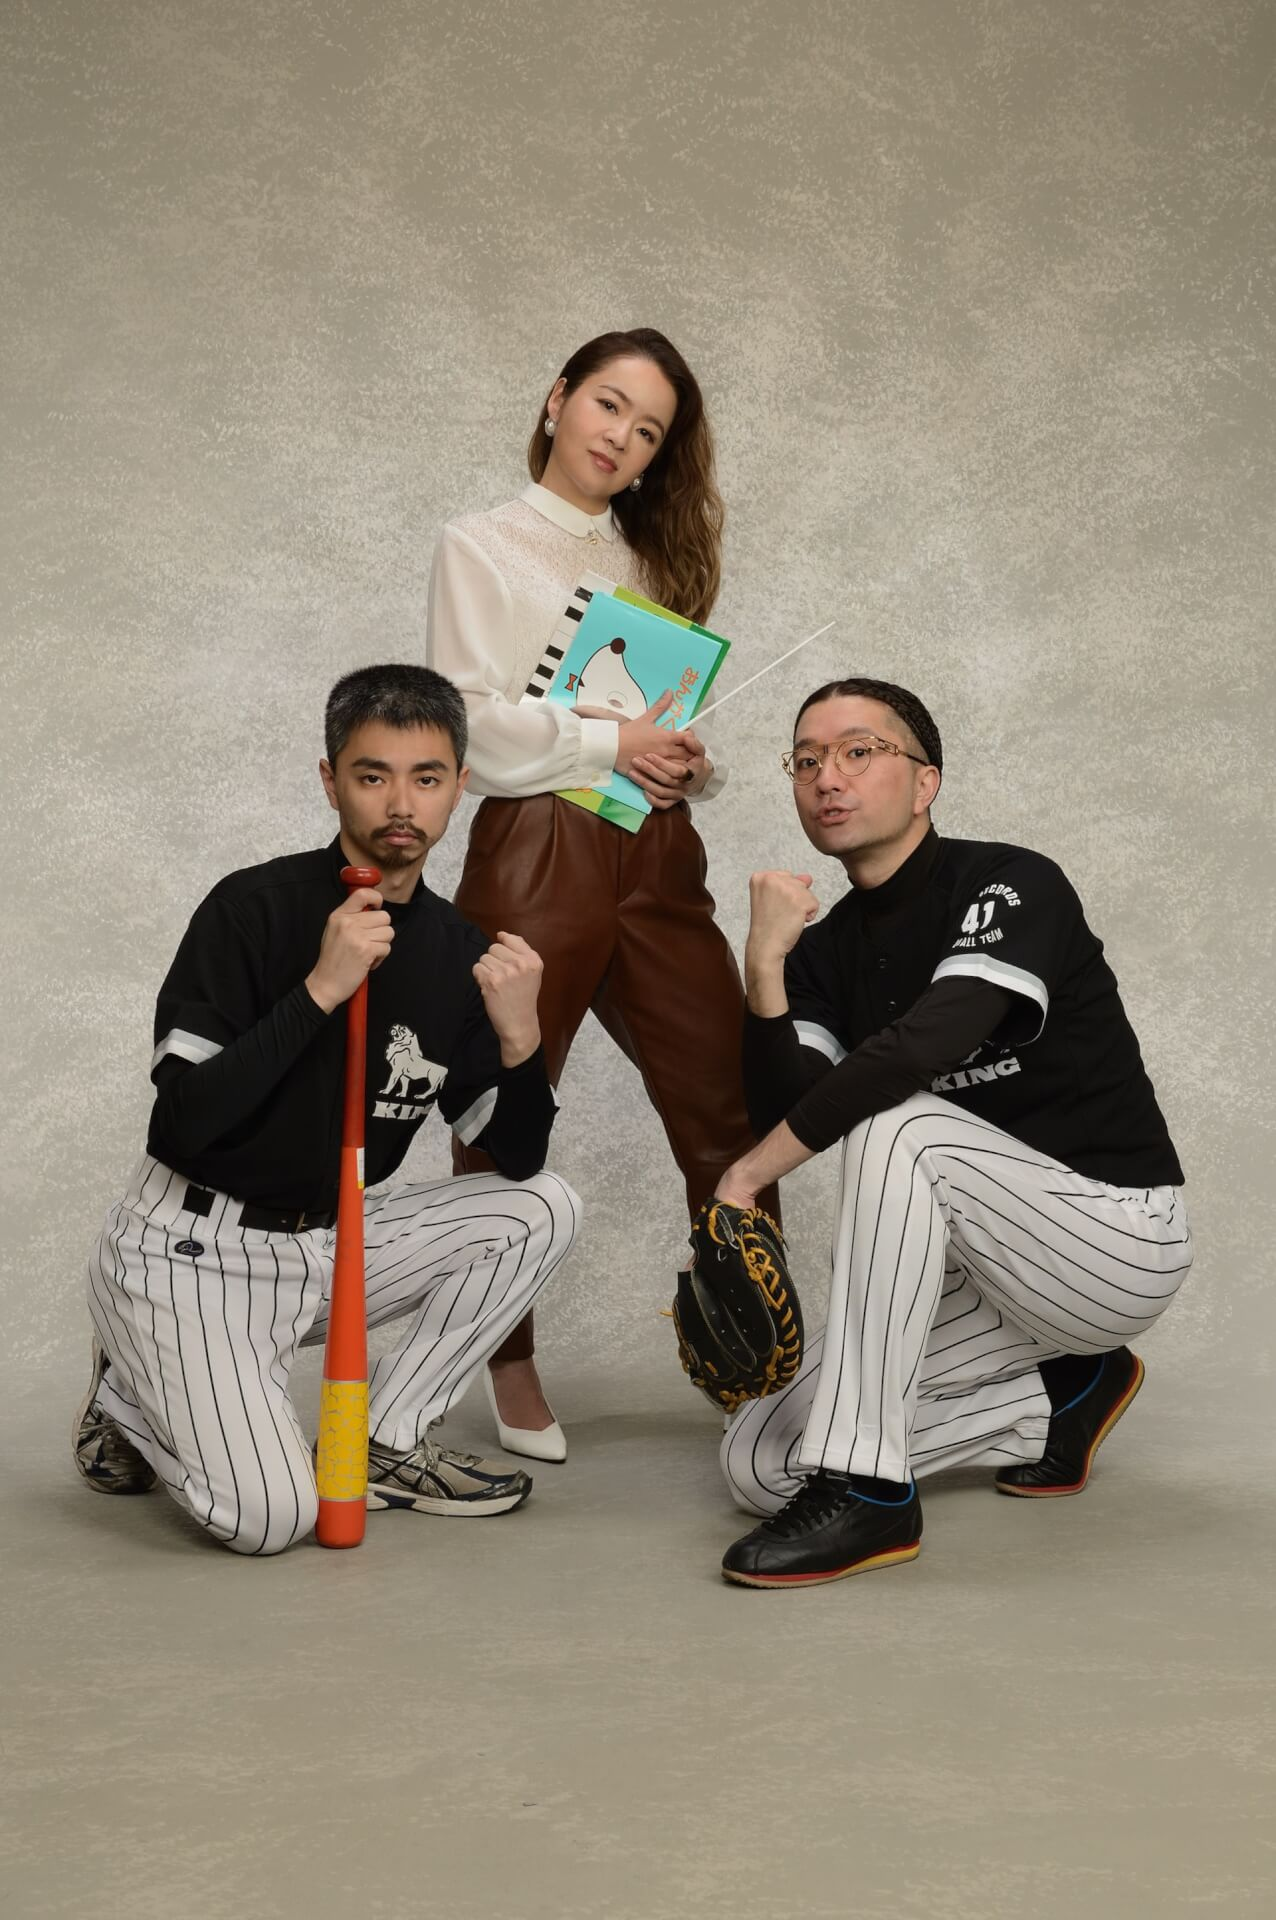 FNCYが1stEP『TOKYO LUV EP』をリリース!メンバー全員が在宅から出演するFNCY<HOME RADIO>の配信も決定 FNCY_Asha_2020